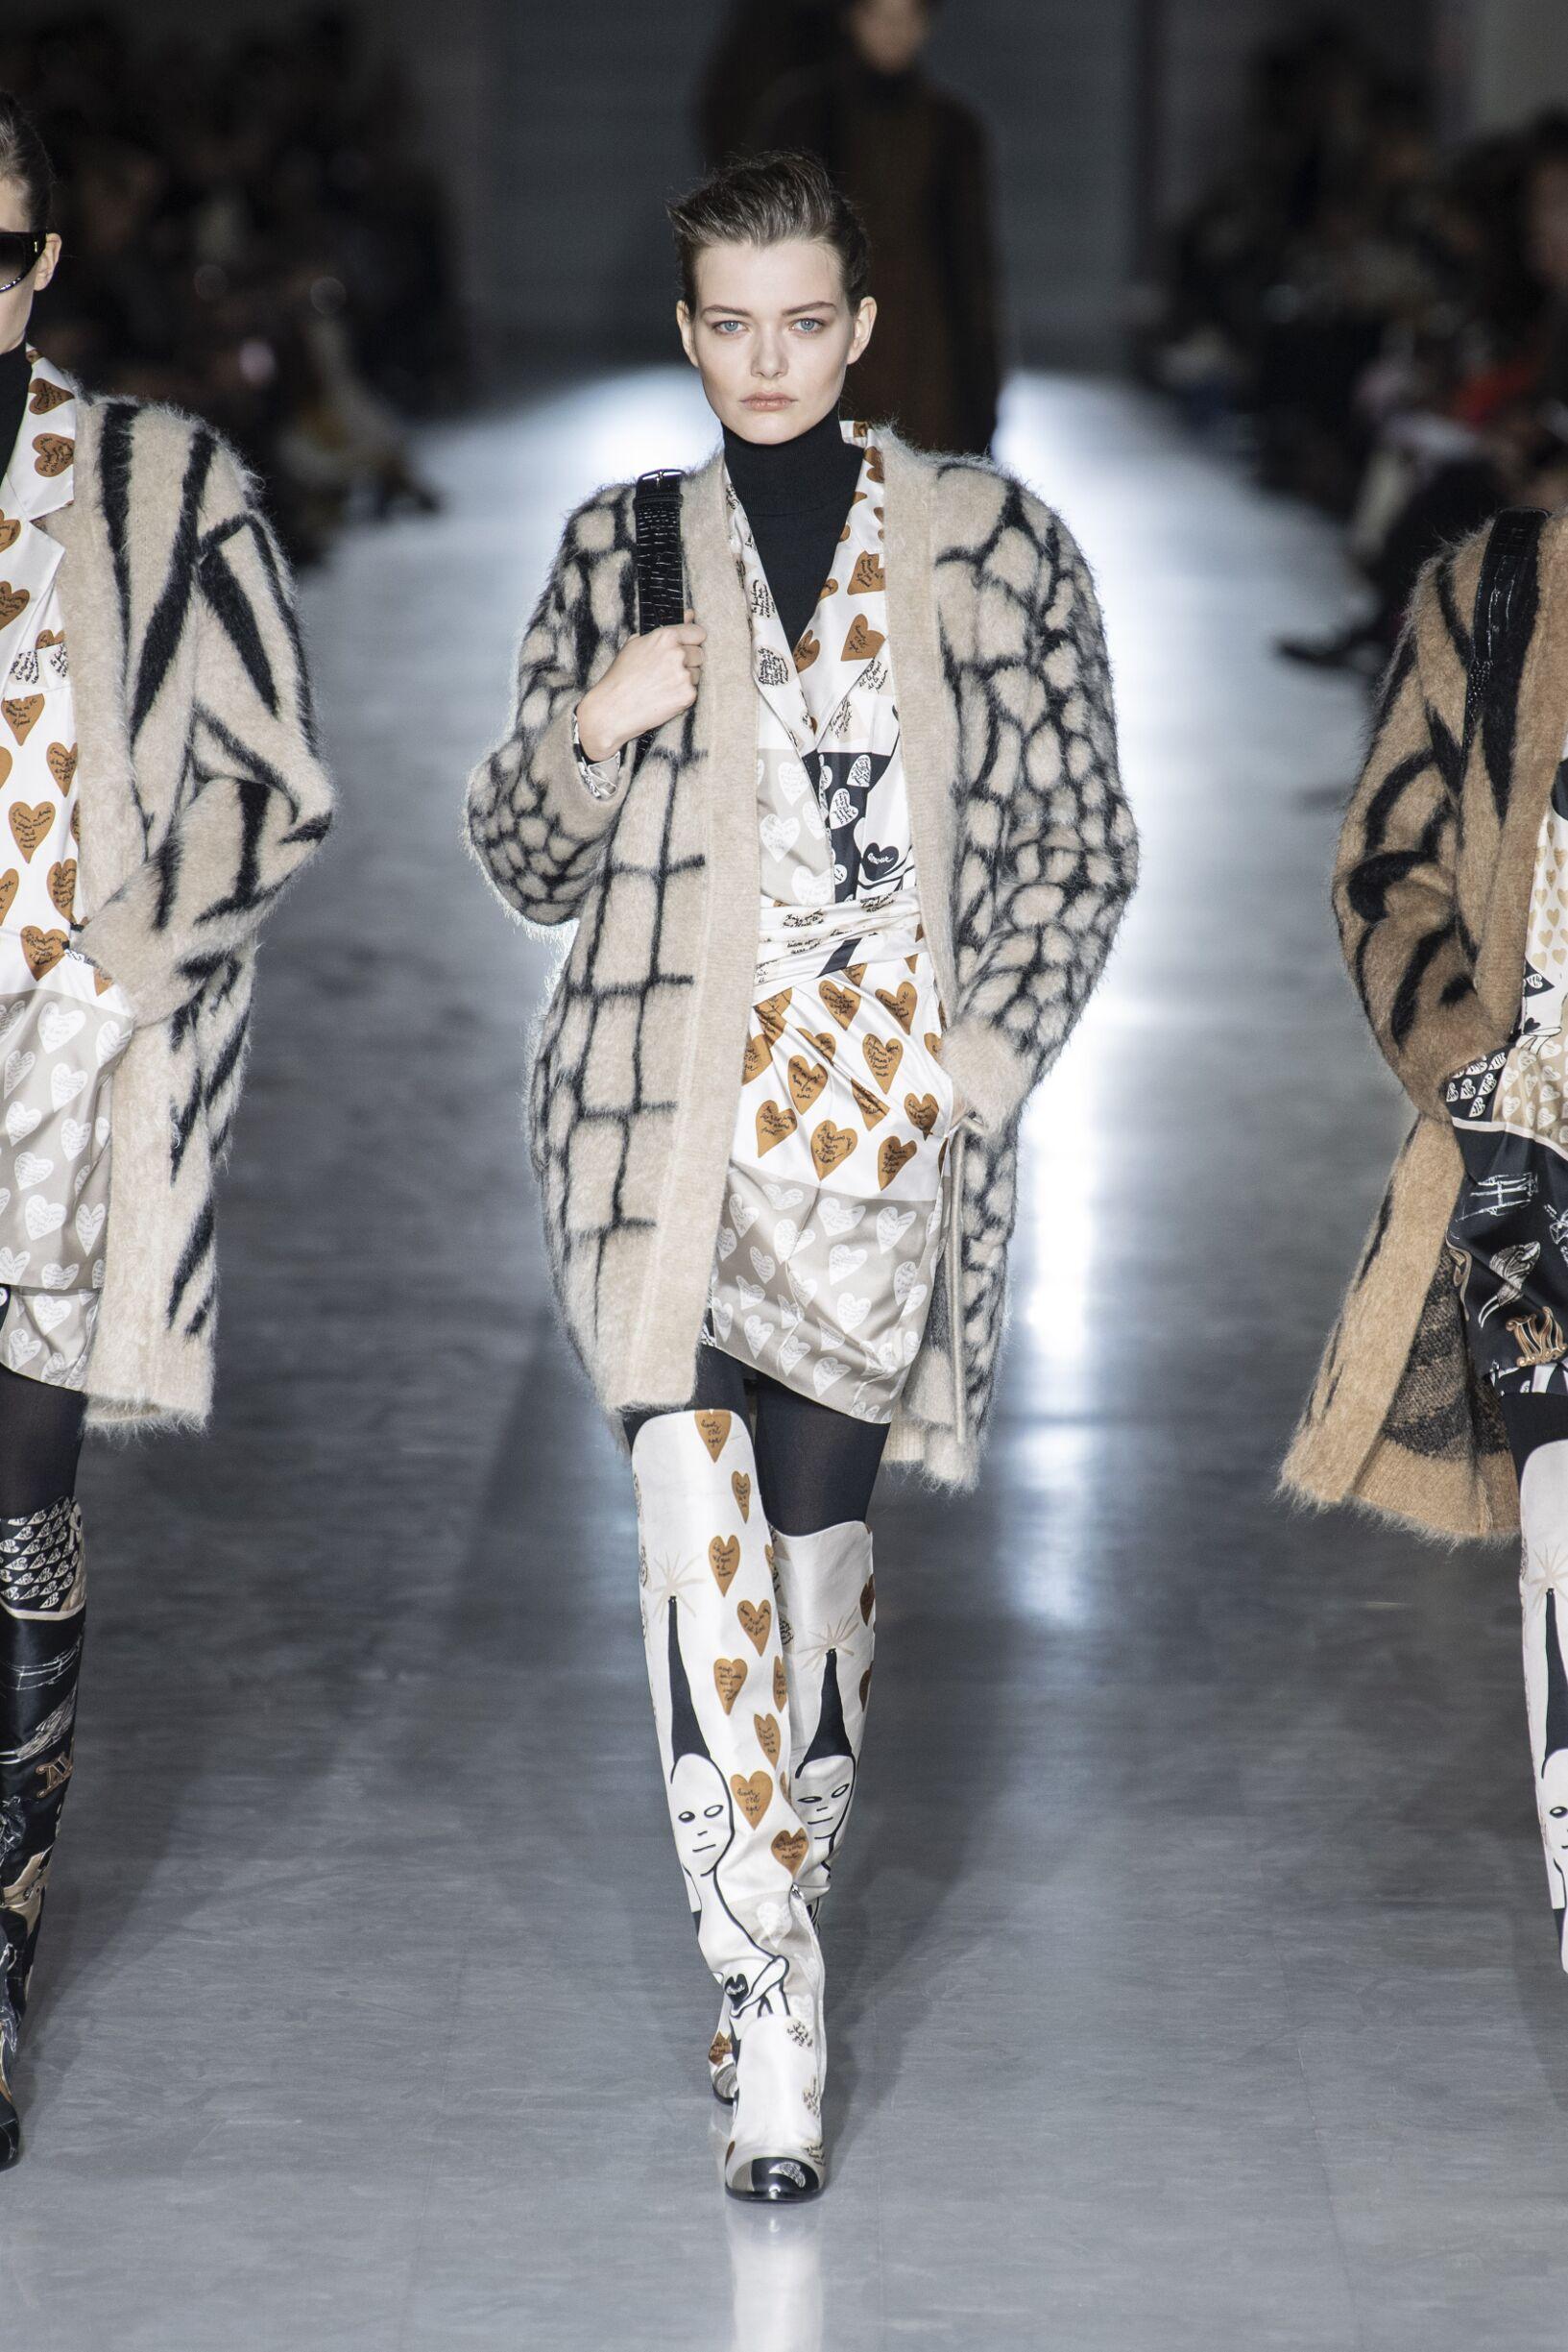 Max Mara Womenswear Fashion Show